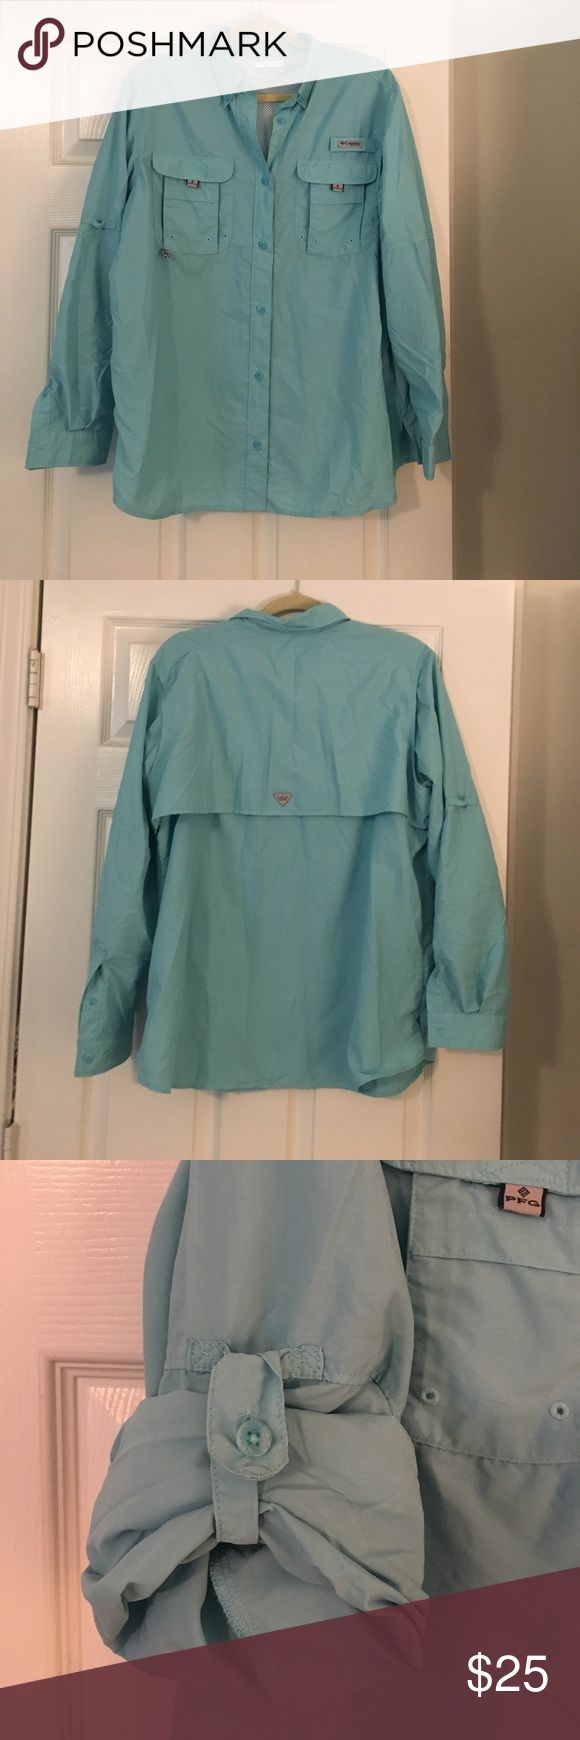 Columbia fishing shirt Cute blue Columbia fishing shirt, perfect for outdoor summer activities Columbia Tops